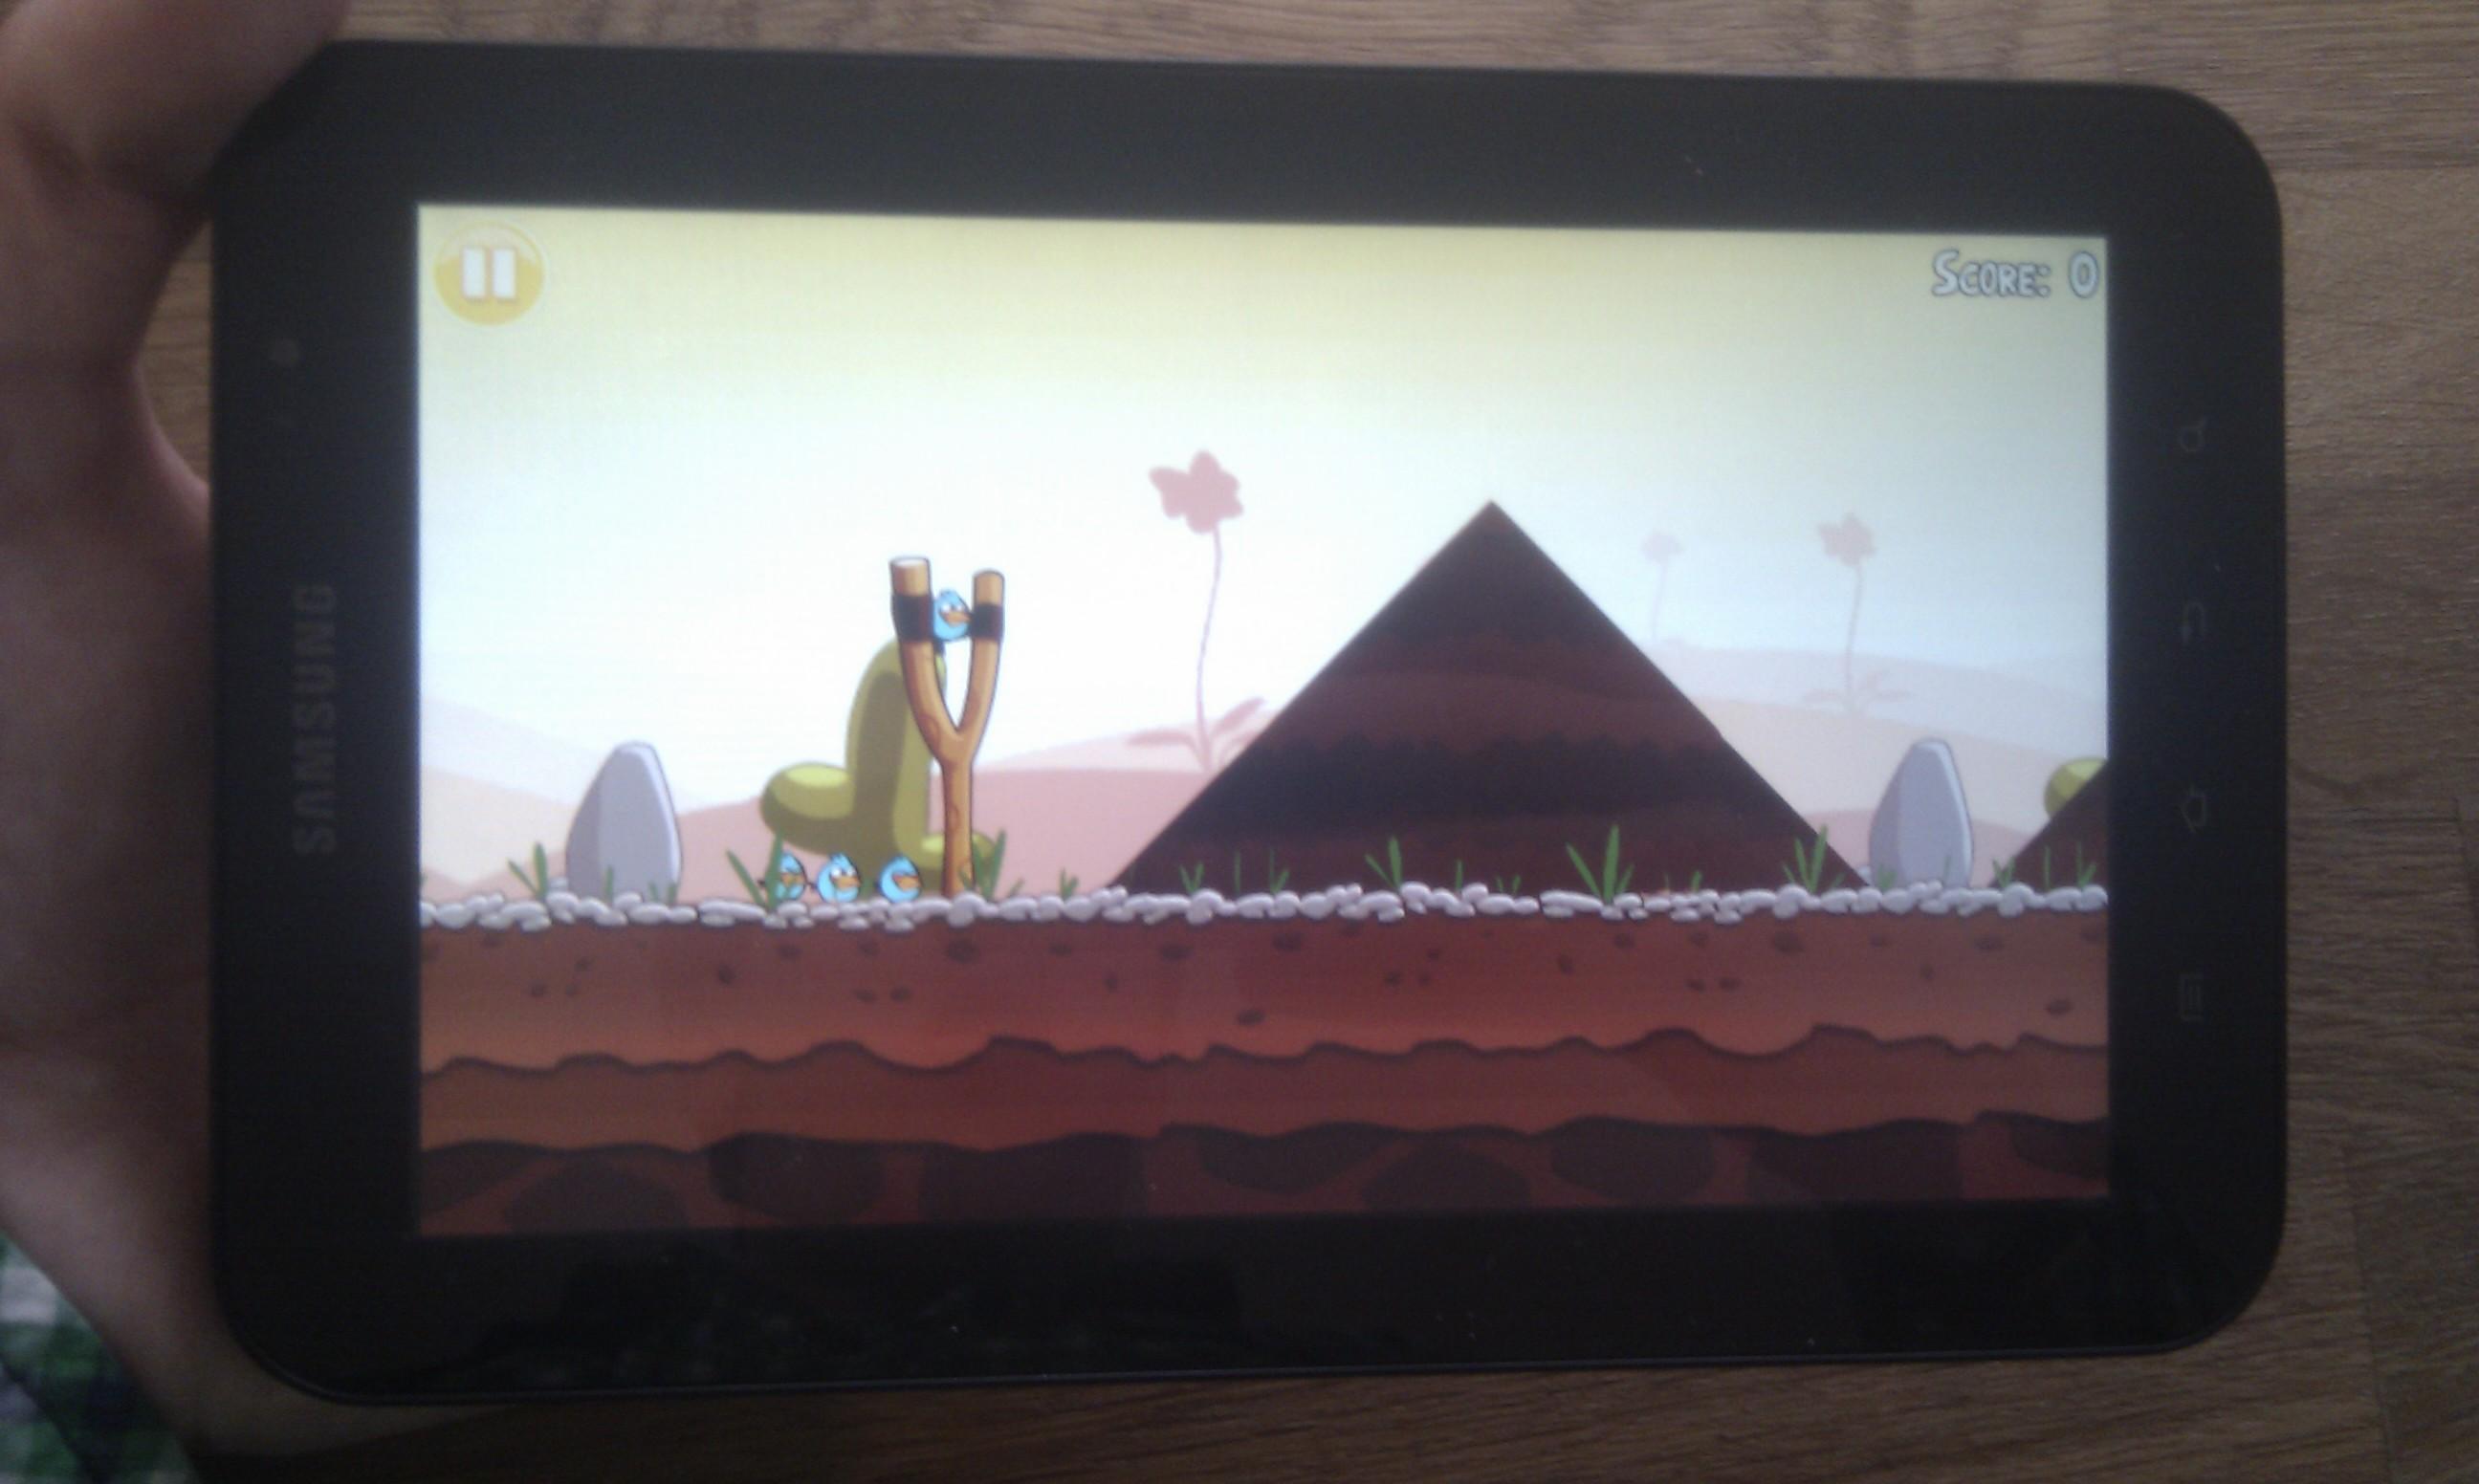 Gamen op een Samsung Galaxy Tab